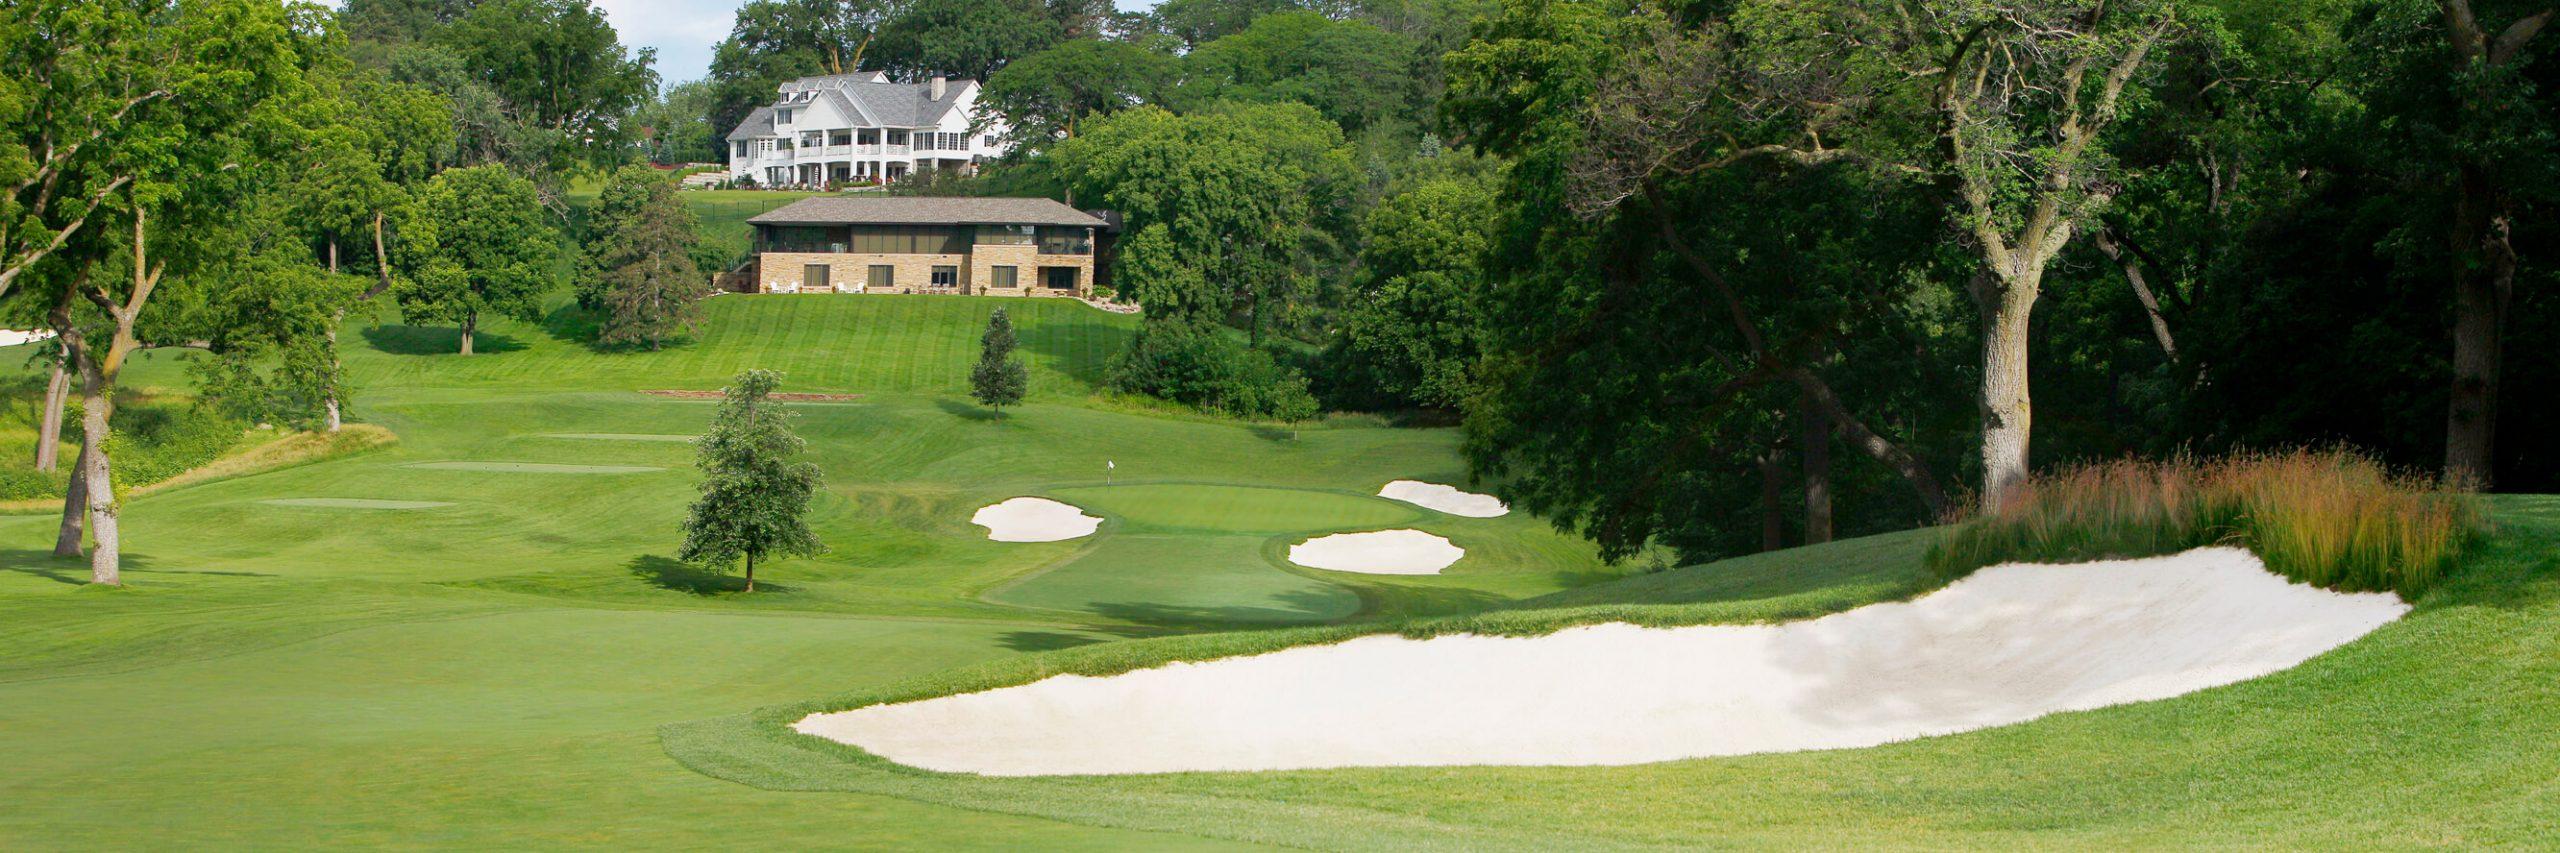 Golf Course Image - Omaha Country Club No. 6